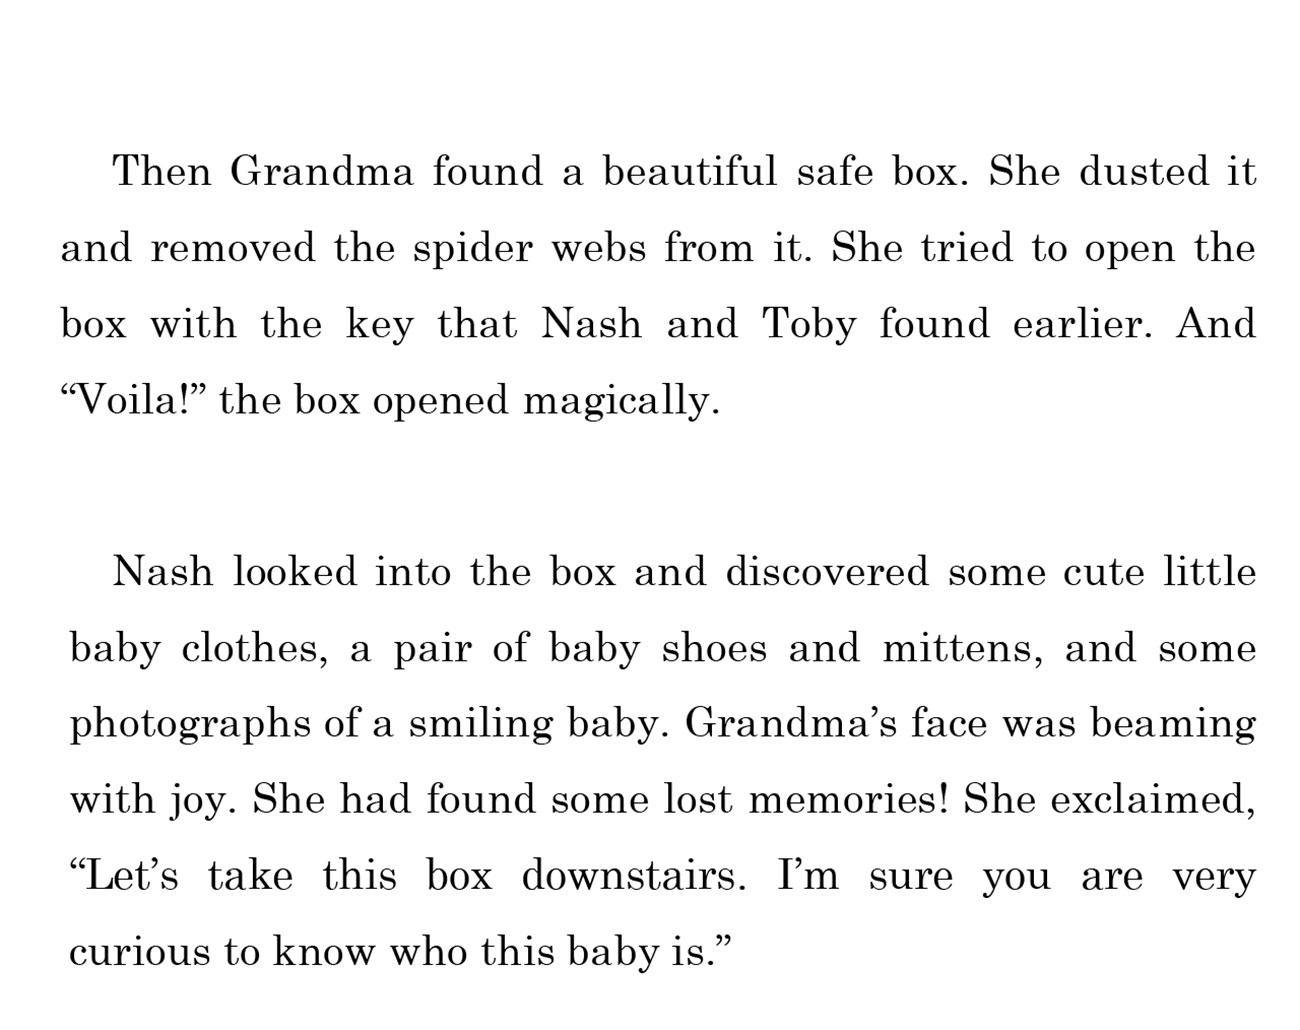 kids short story 'Down the memory lane with nash' by uma bala devarakonda - page 14